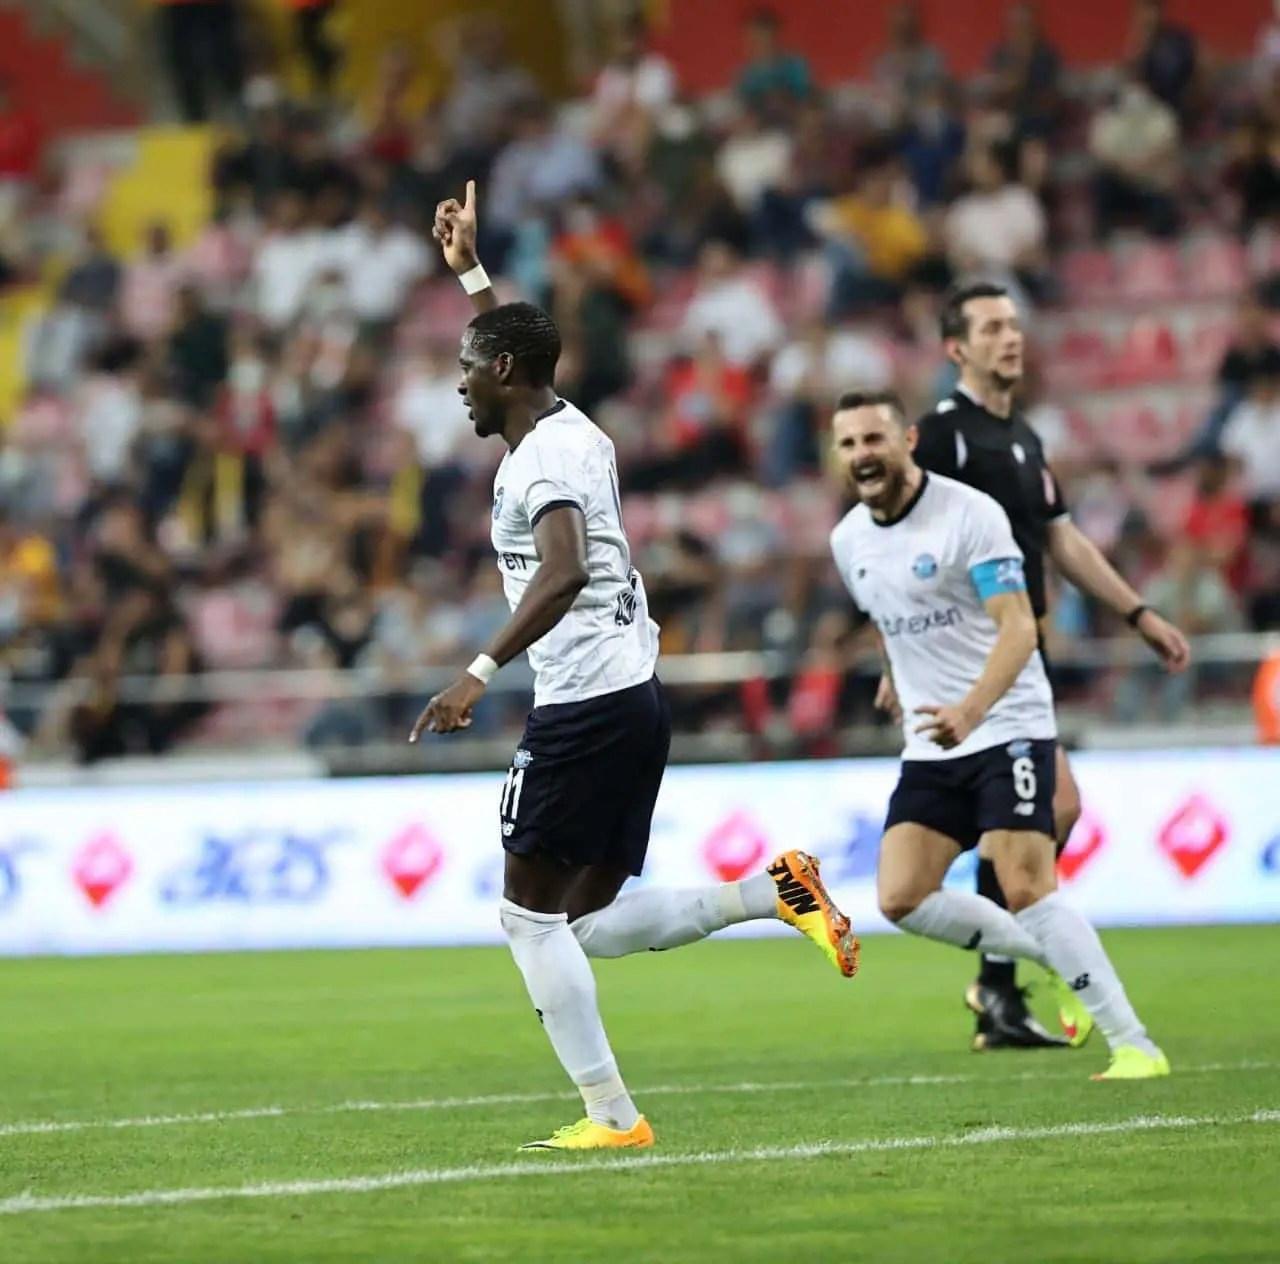 Turkey: David Akintola Rescues Point For Adana Demispor Against Kayserispor